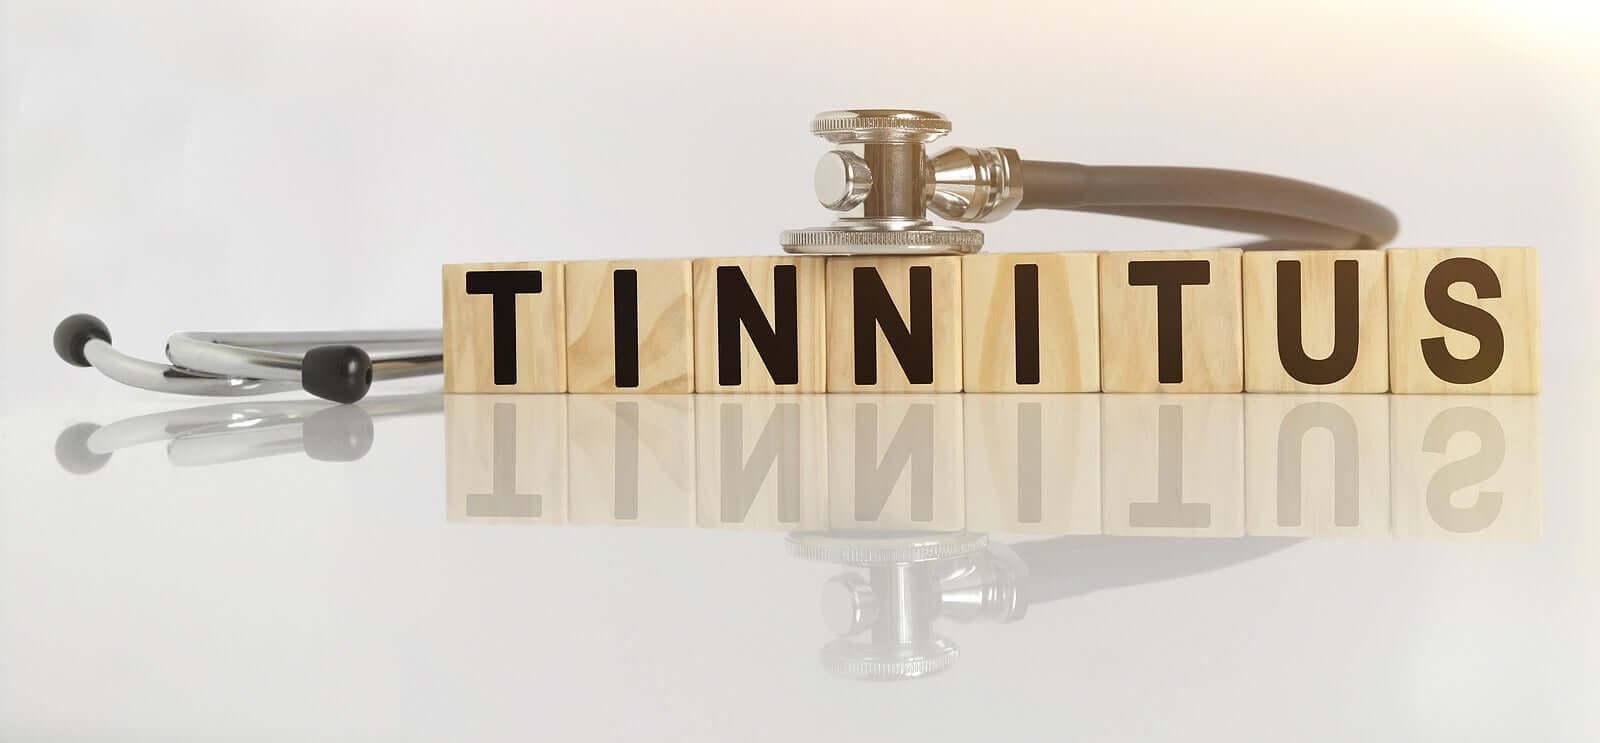 "Wooden blocks that read ""tinnitus""."